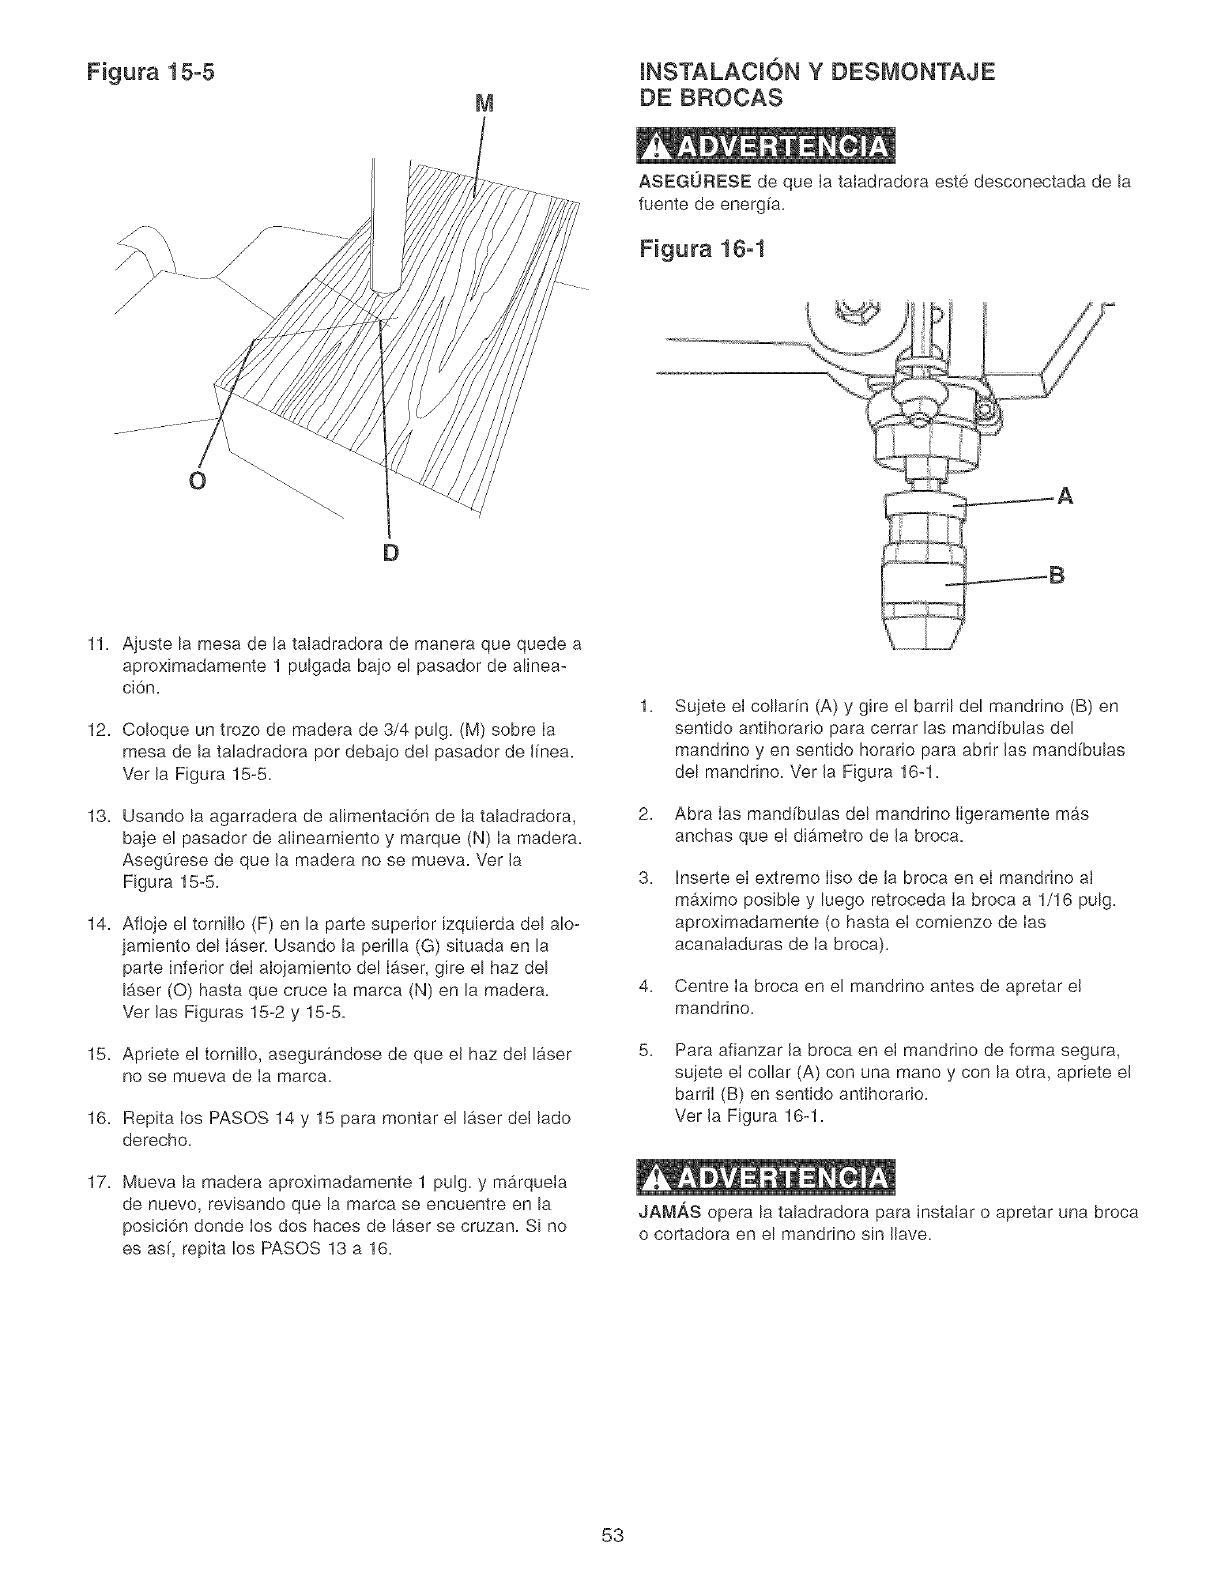 Craftsman 152229000 User Manual Drill Press Manuals And Guides L0520637